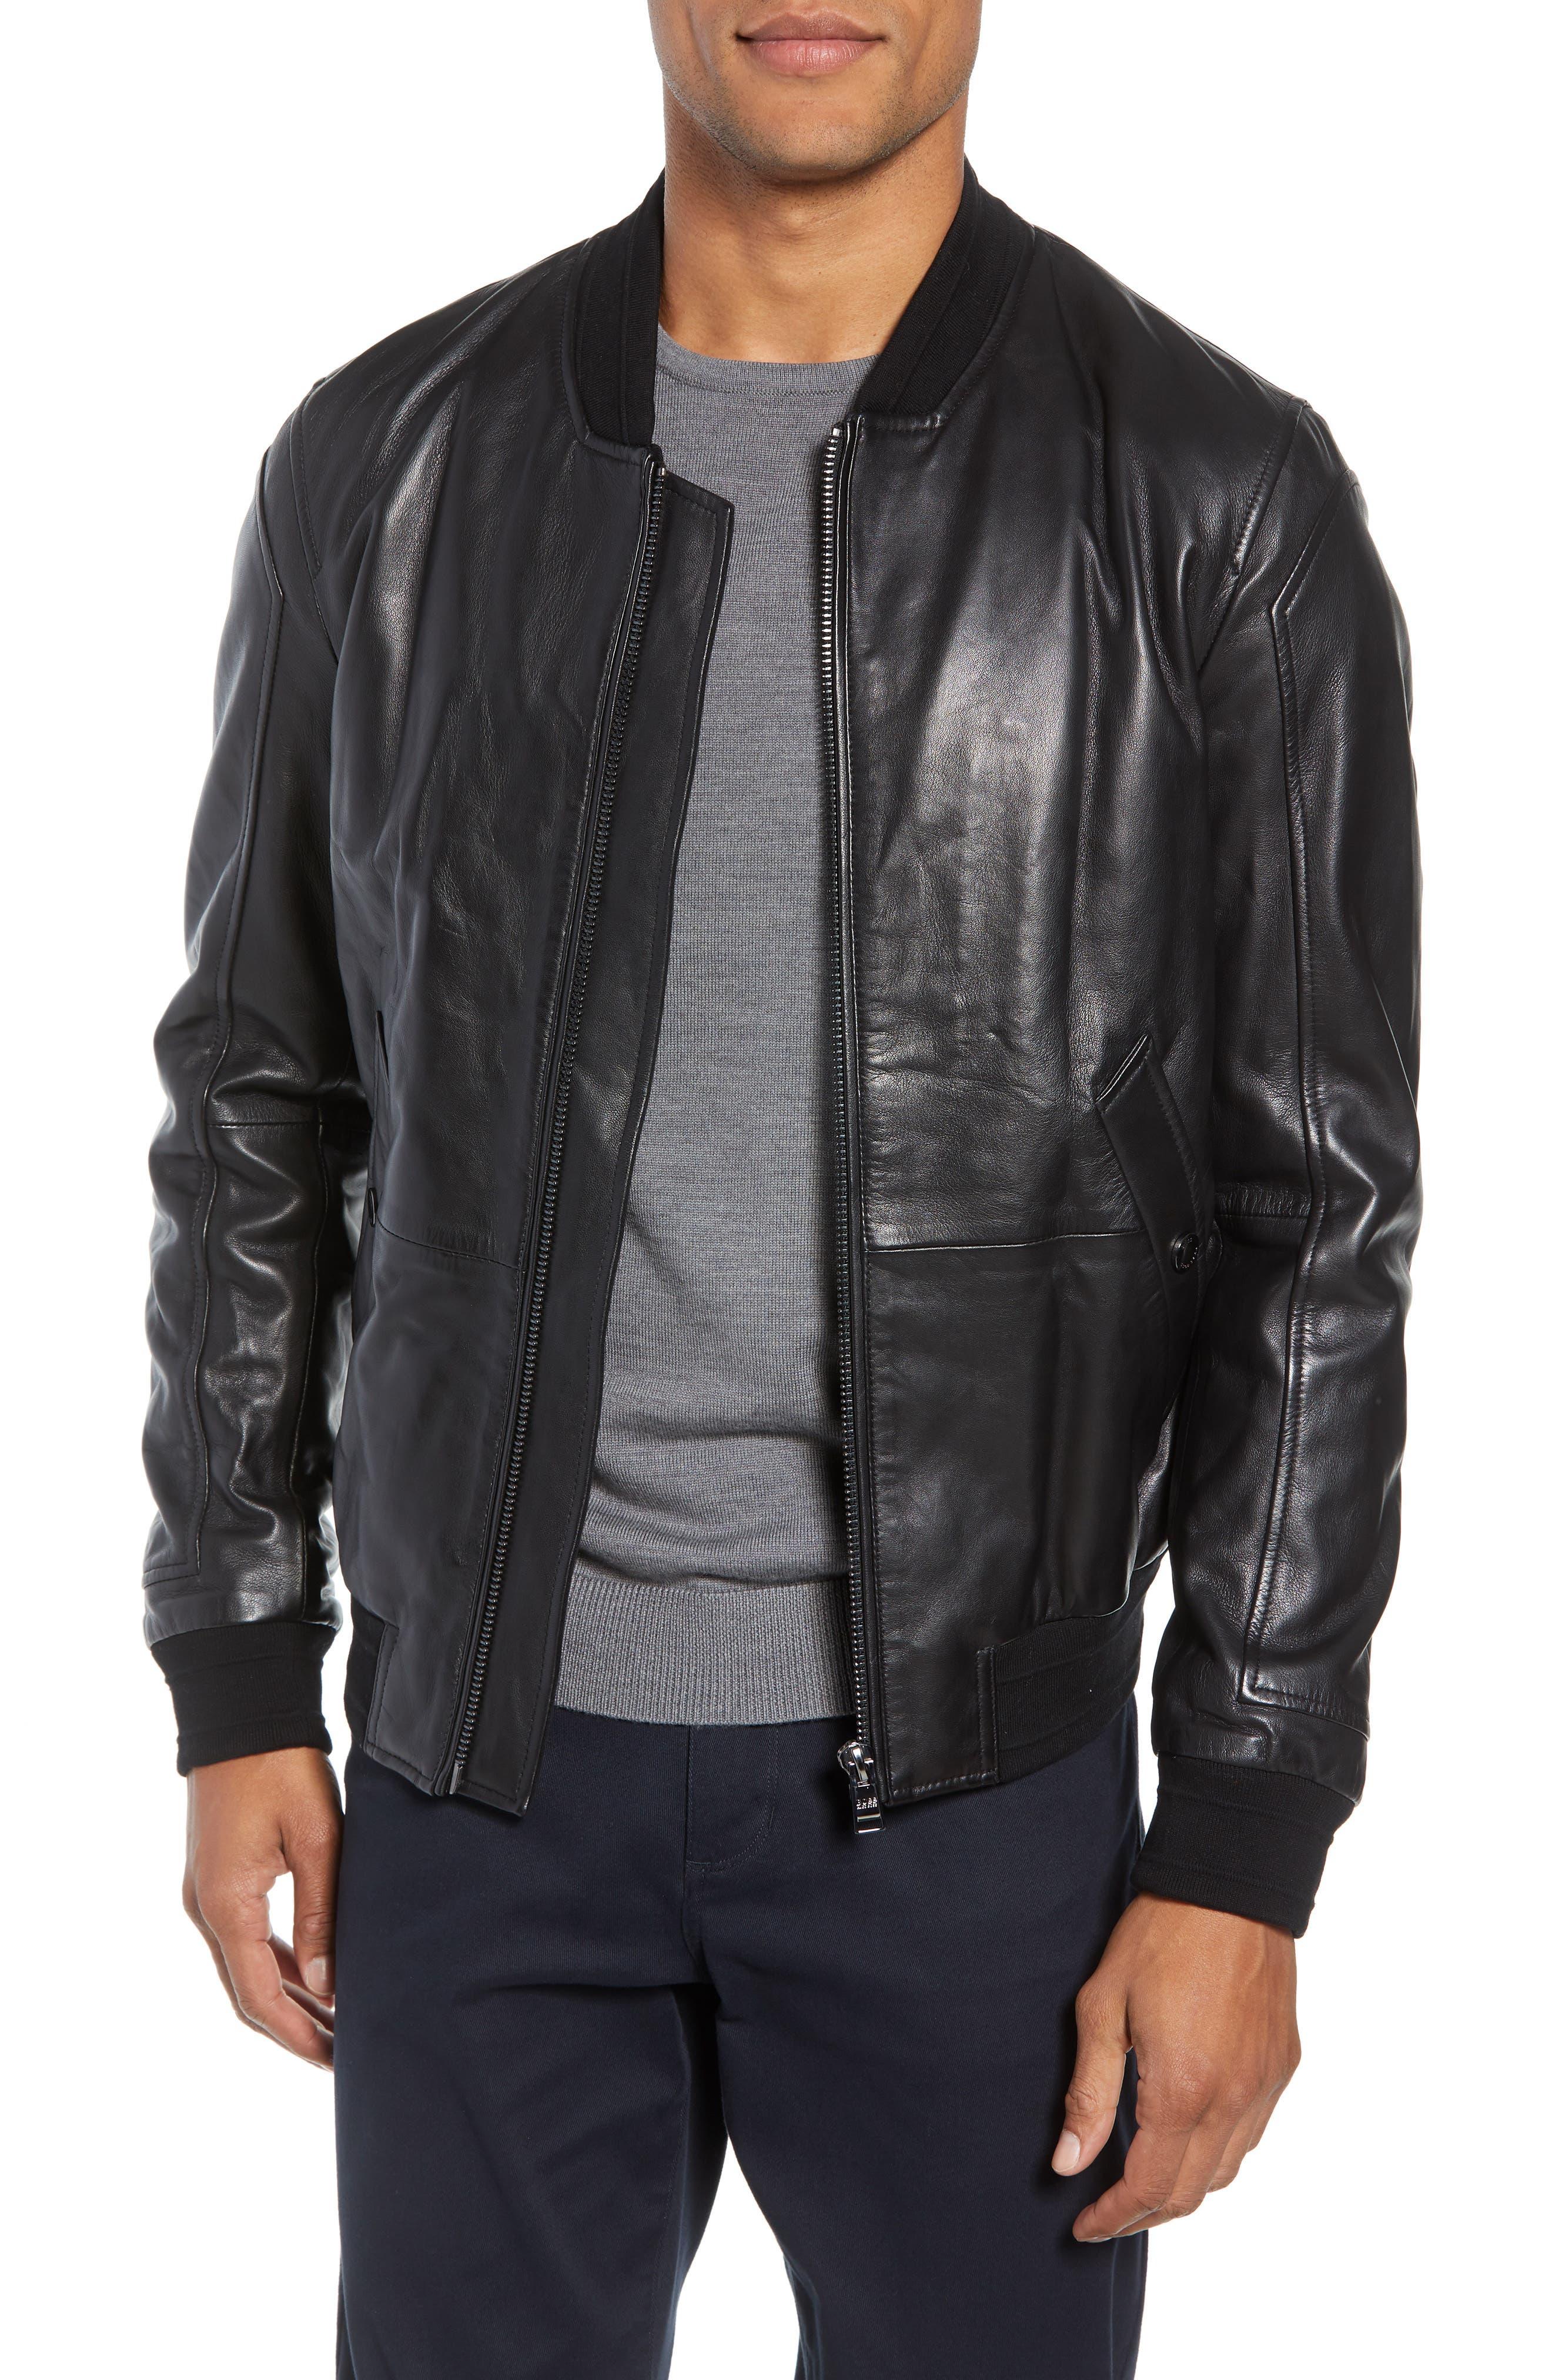 Arinos Leather Bomber Jacket,                         Main,                         color, BLACK